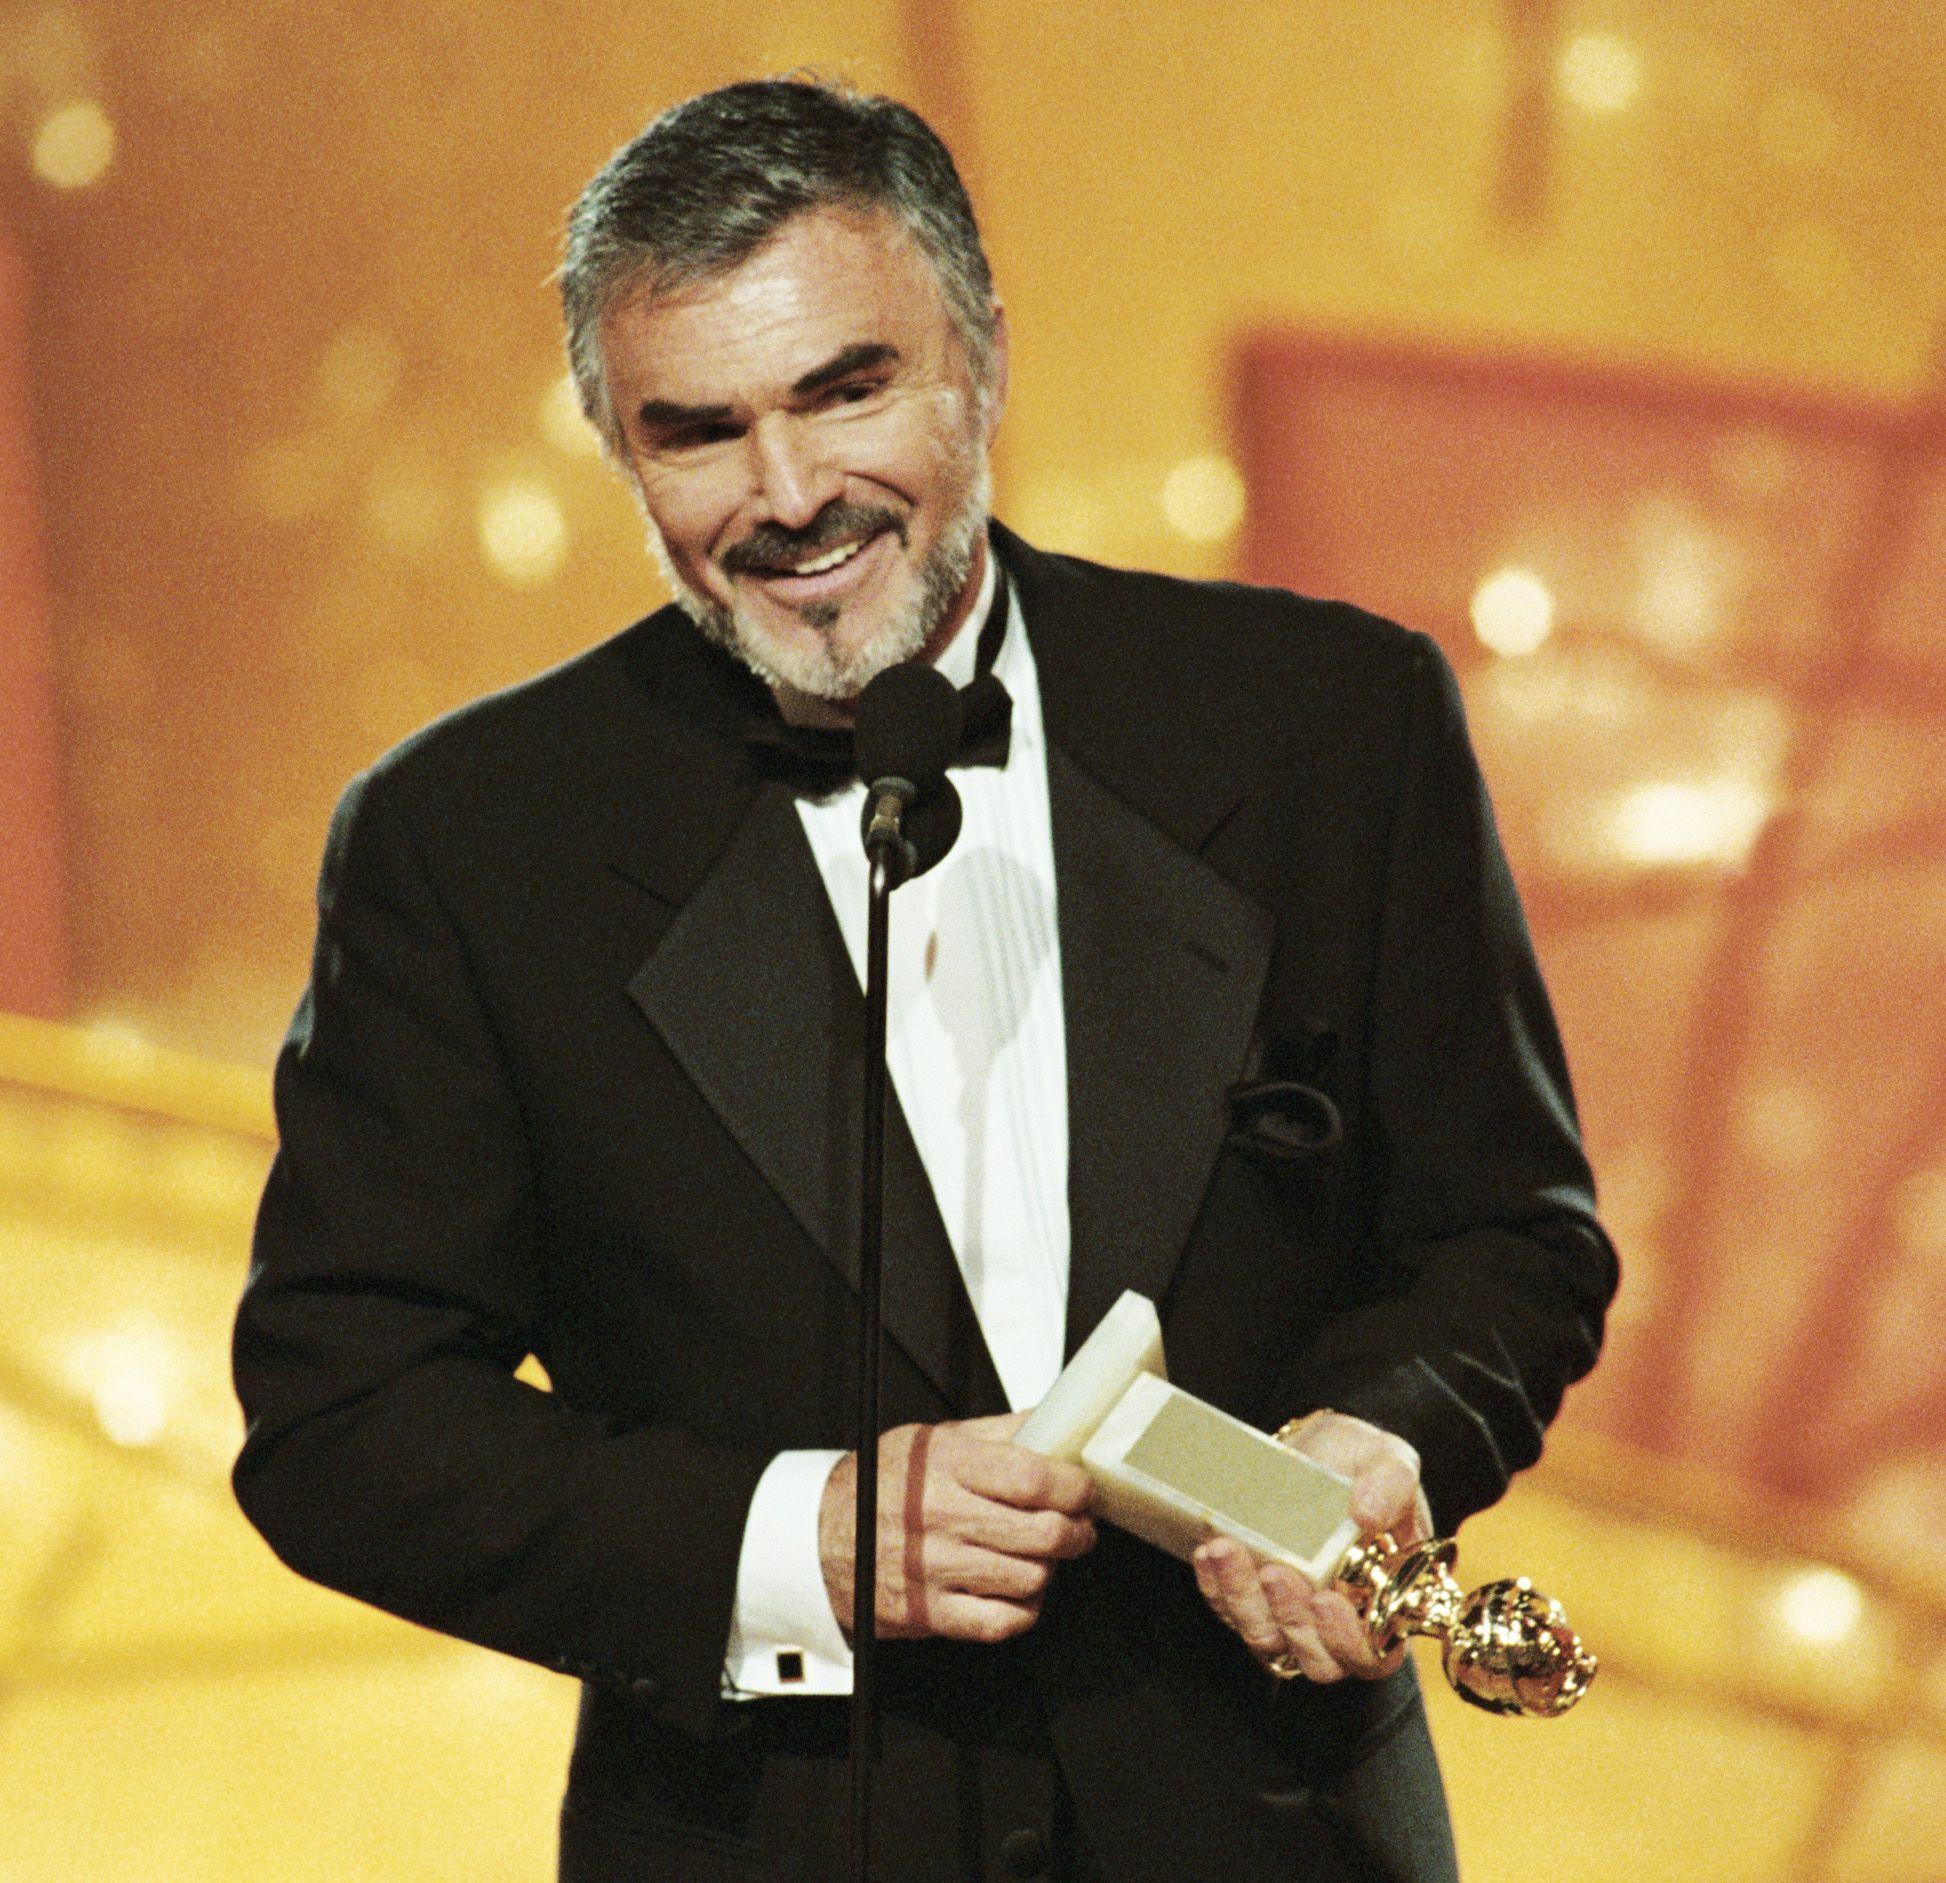 Hollywood actor Burt Reynolds dies aged 82